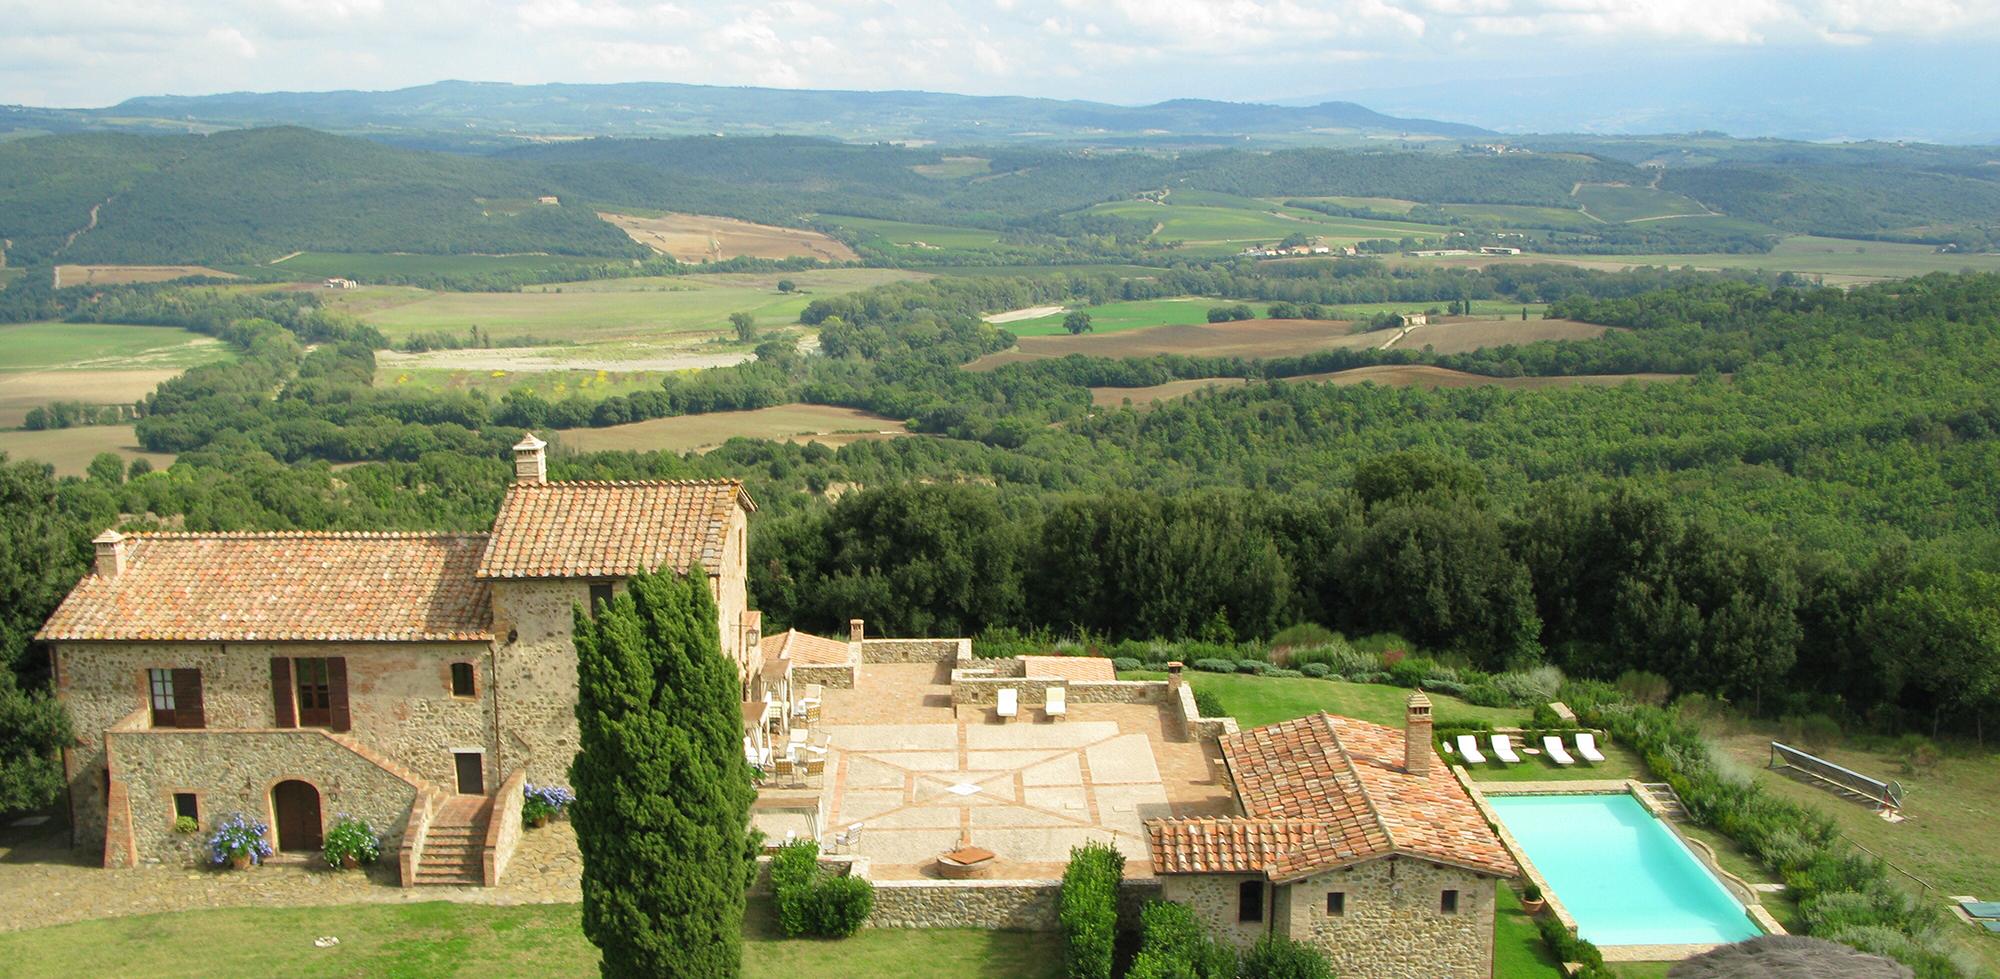 Dreamy Tuscany Views at Brunello